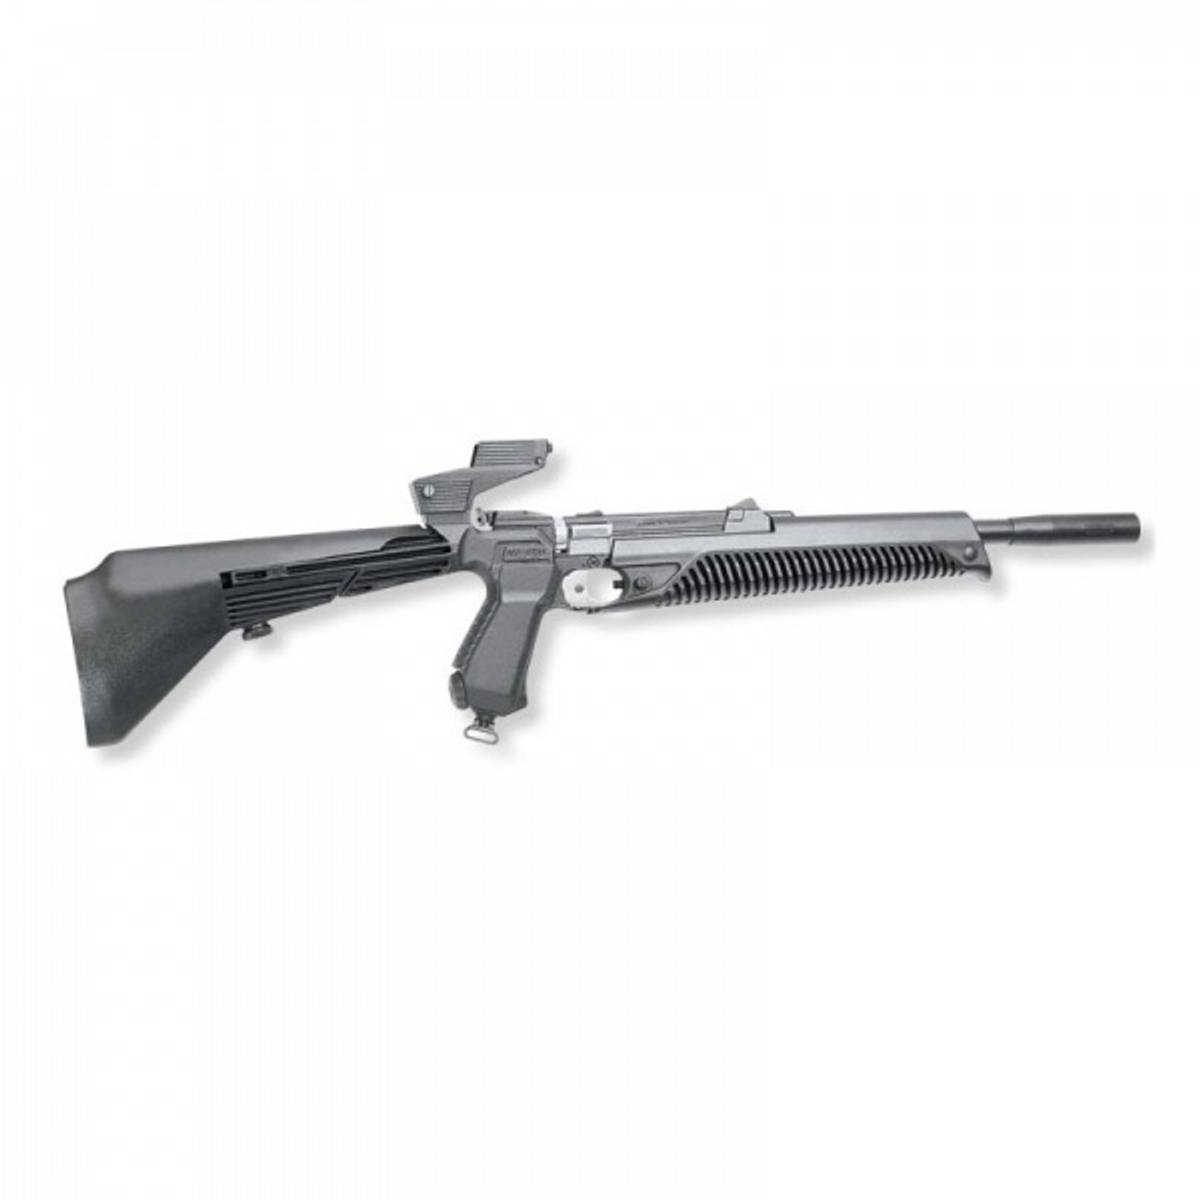 Baikal - 651K Pistol/Rifle - 4.5mm